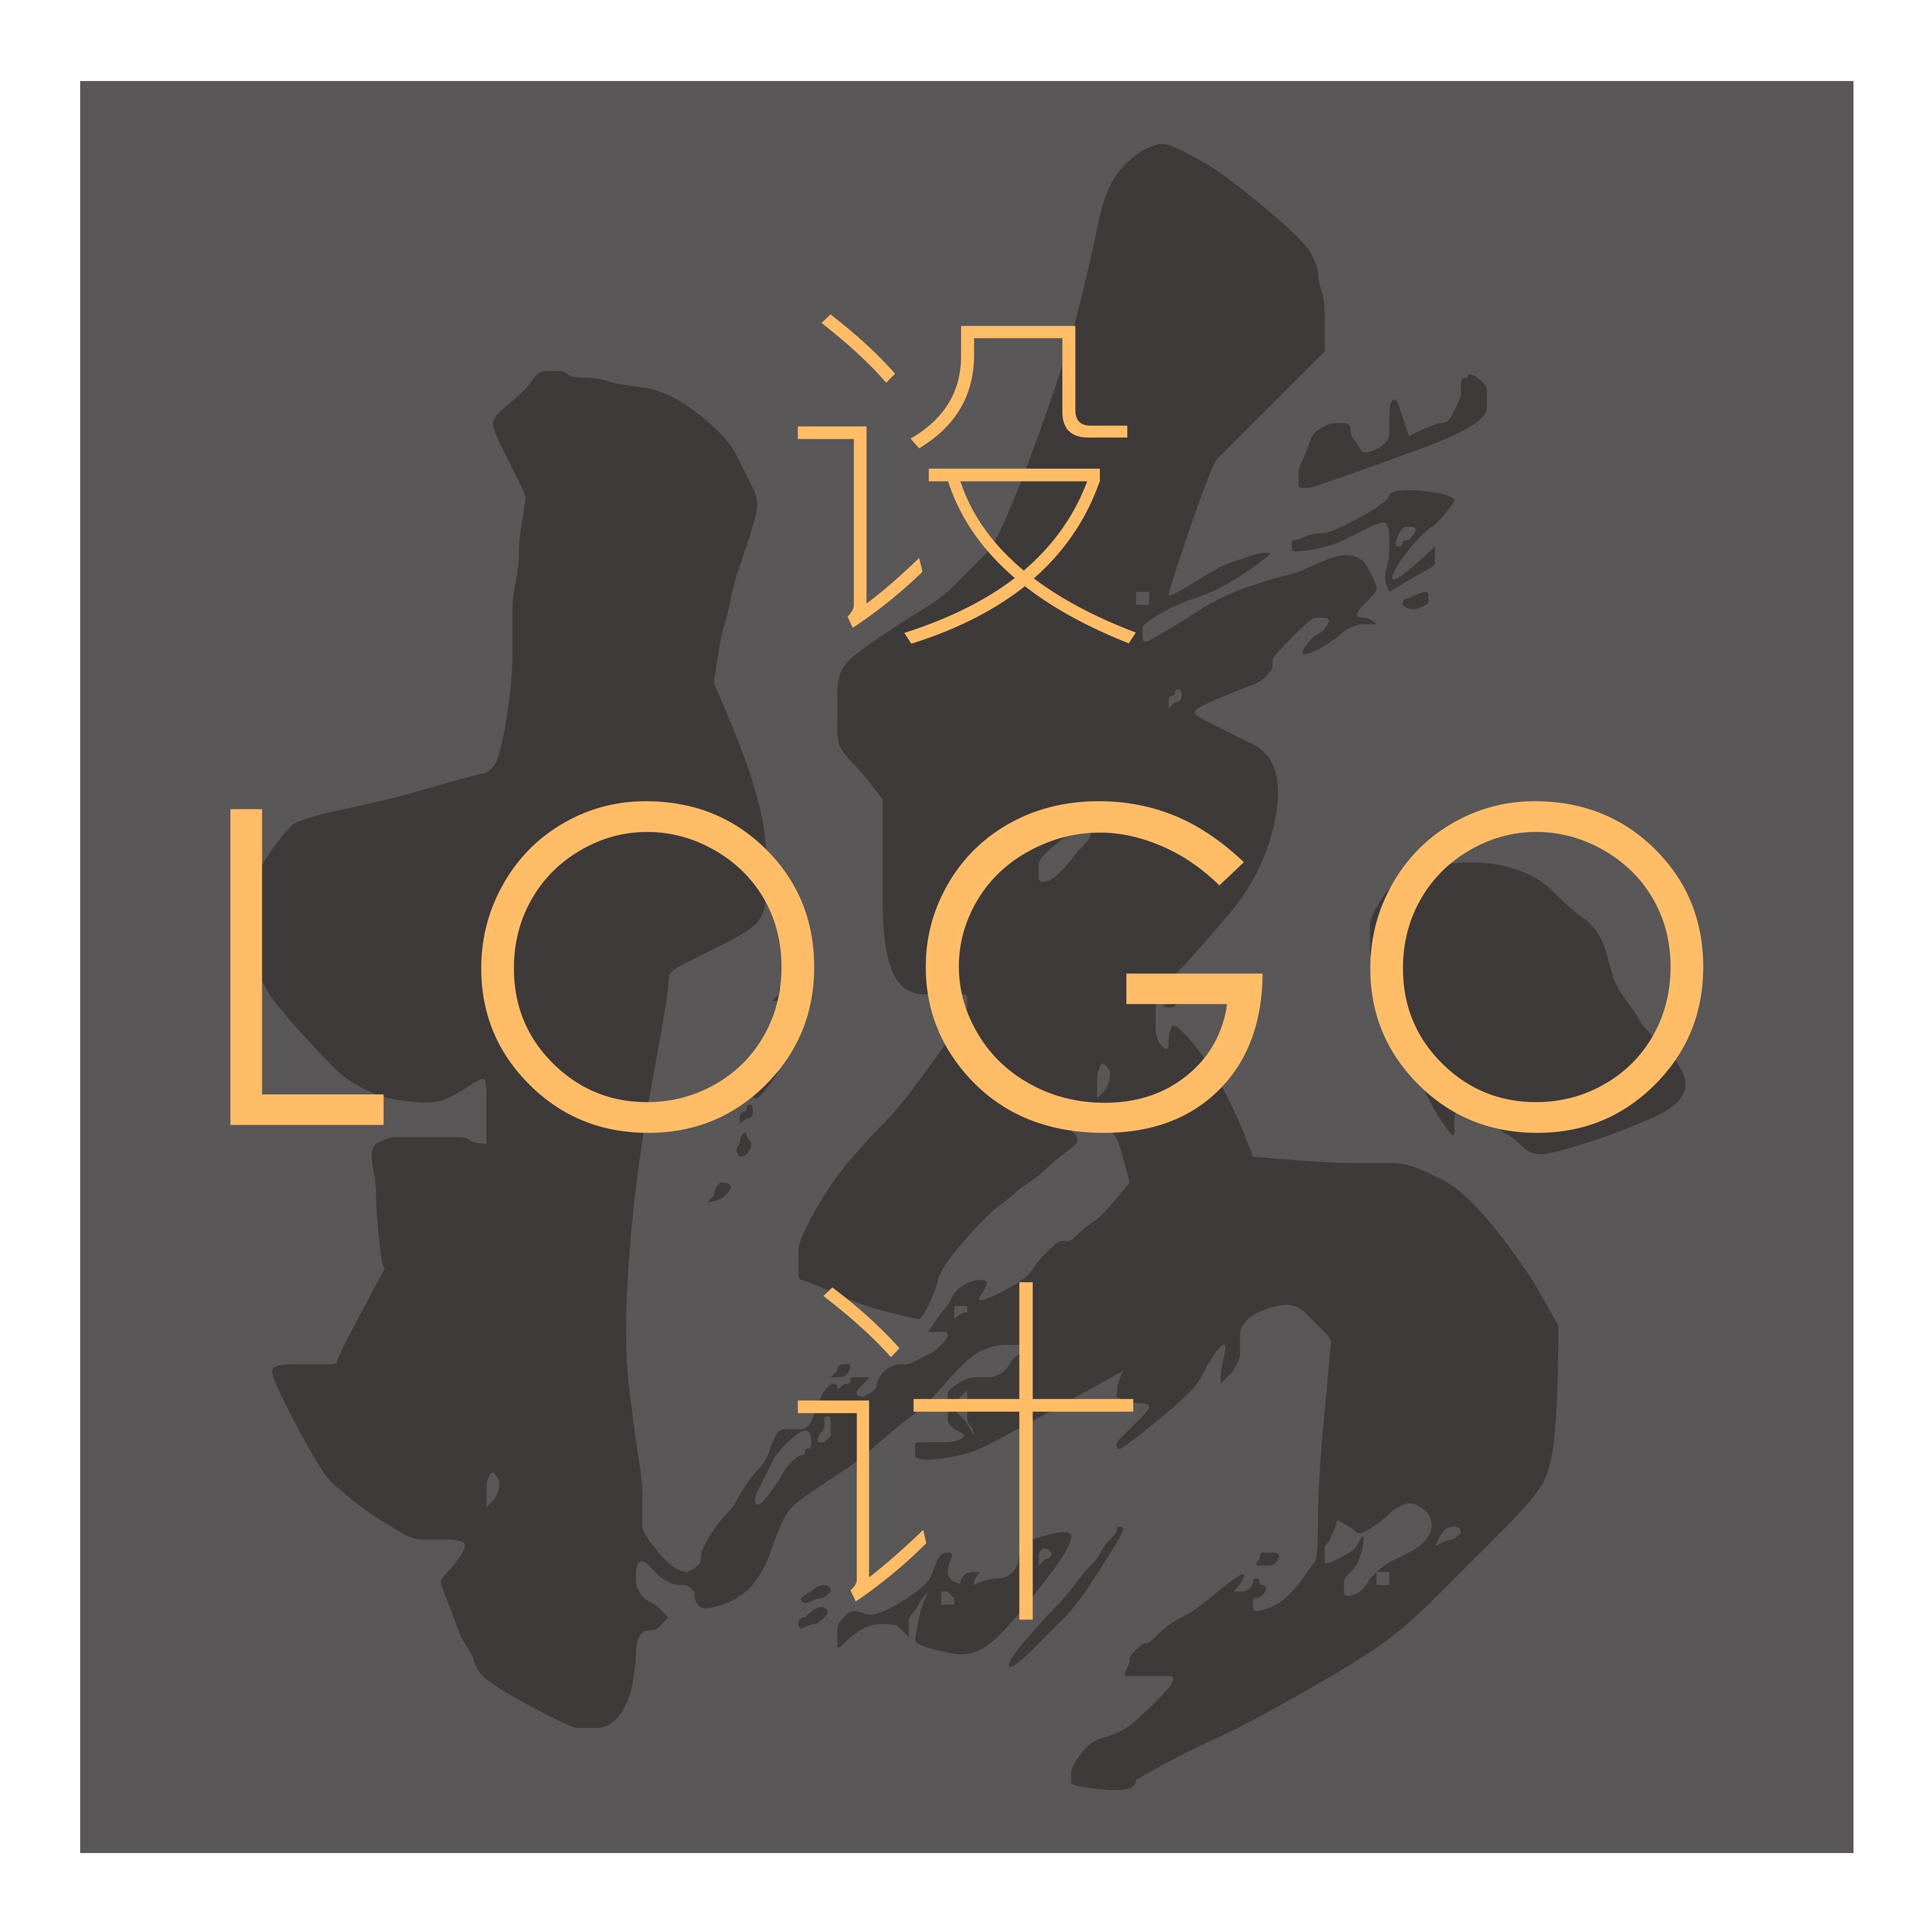 logo设计/高端LOGO/餐饮科技互联网企业公司图形标志